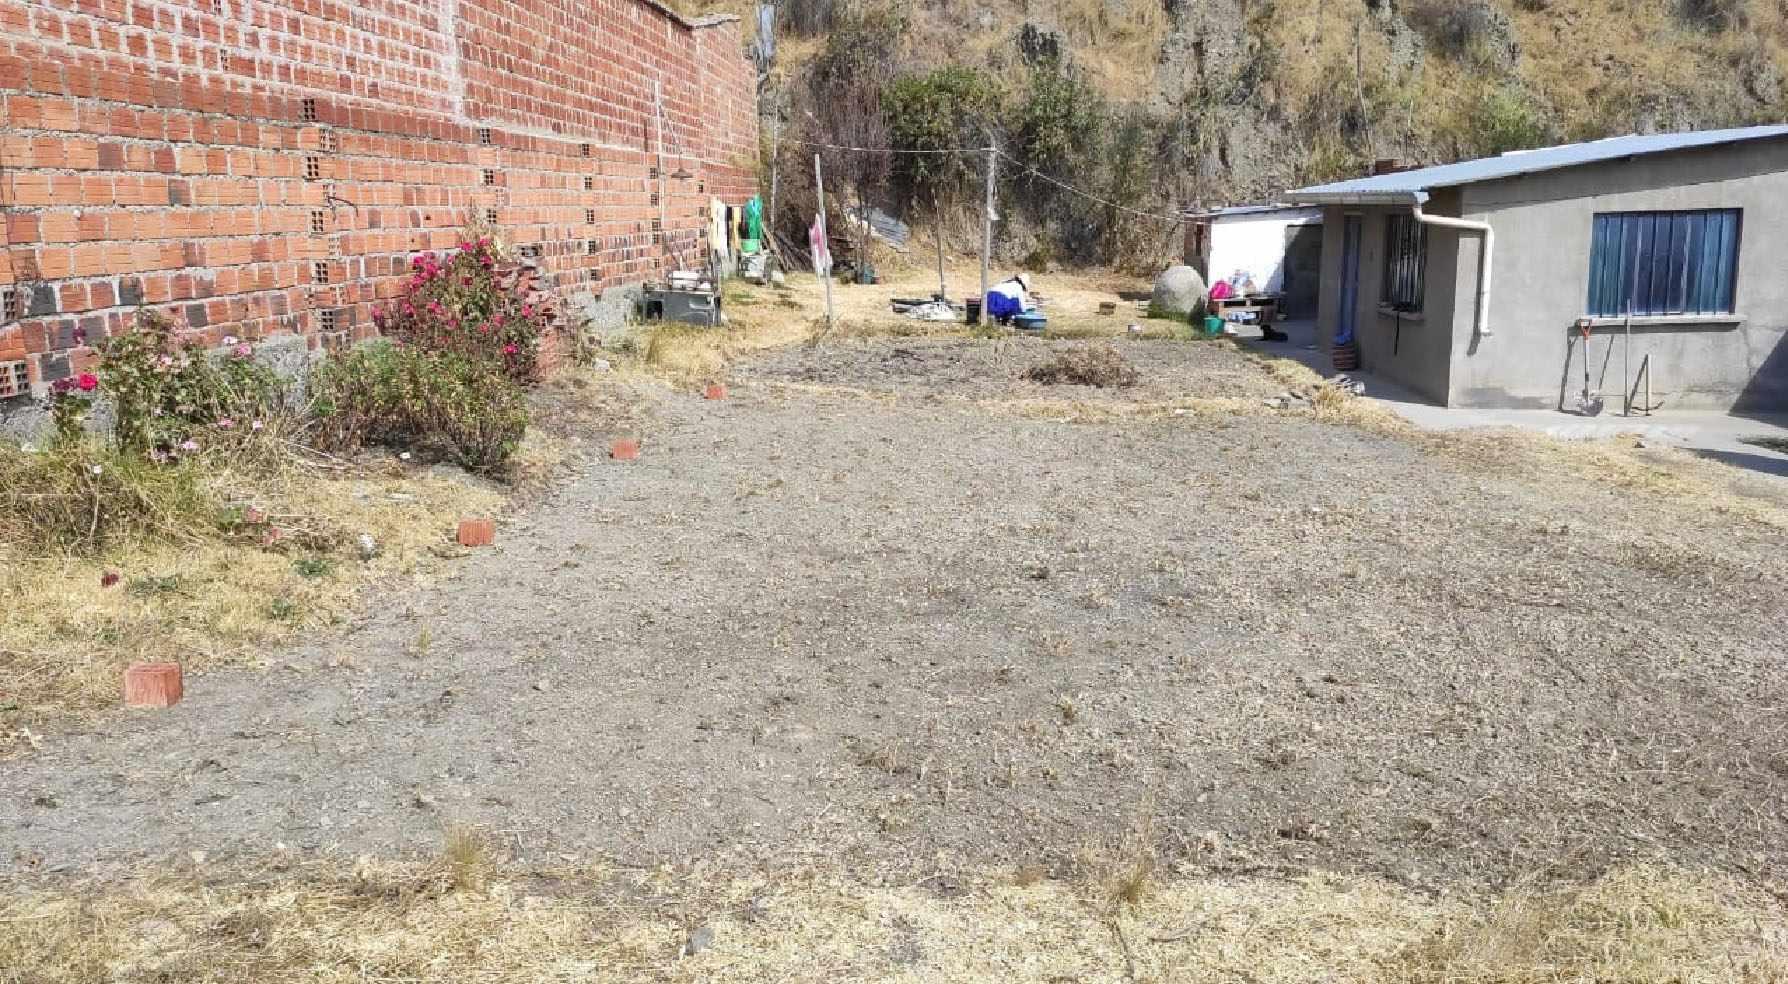 Terreno en Alquiler Av. Costanera Jilusaya, ingreso por la calle 58, zona de Chasquipampa Foto 2